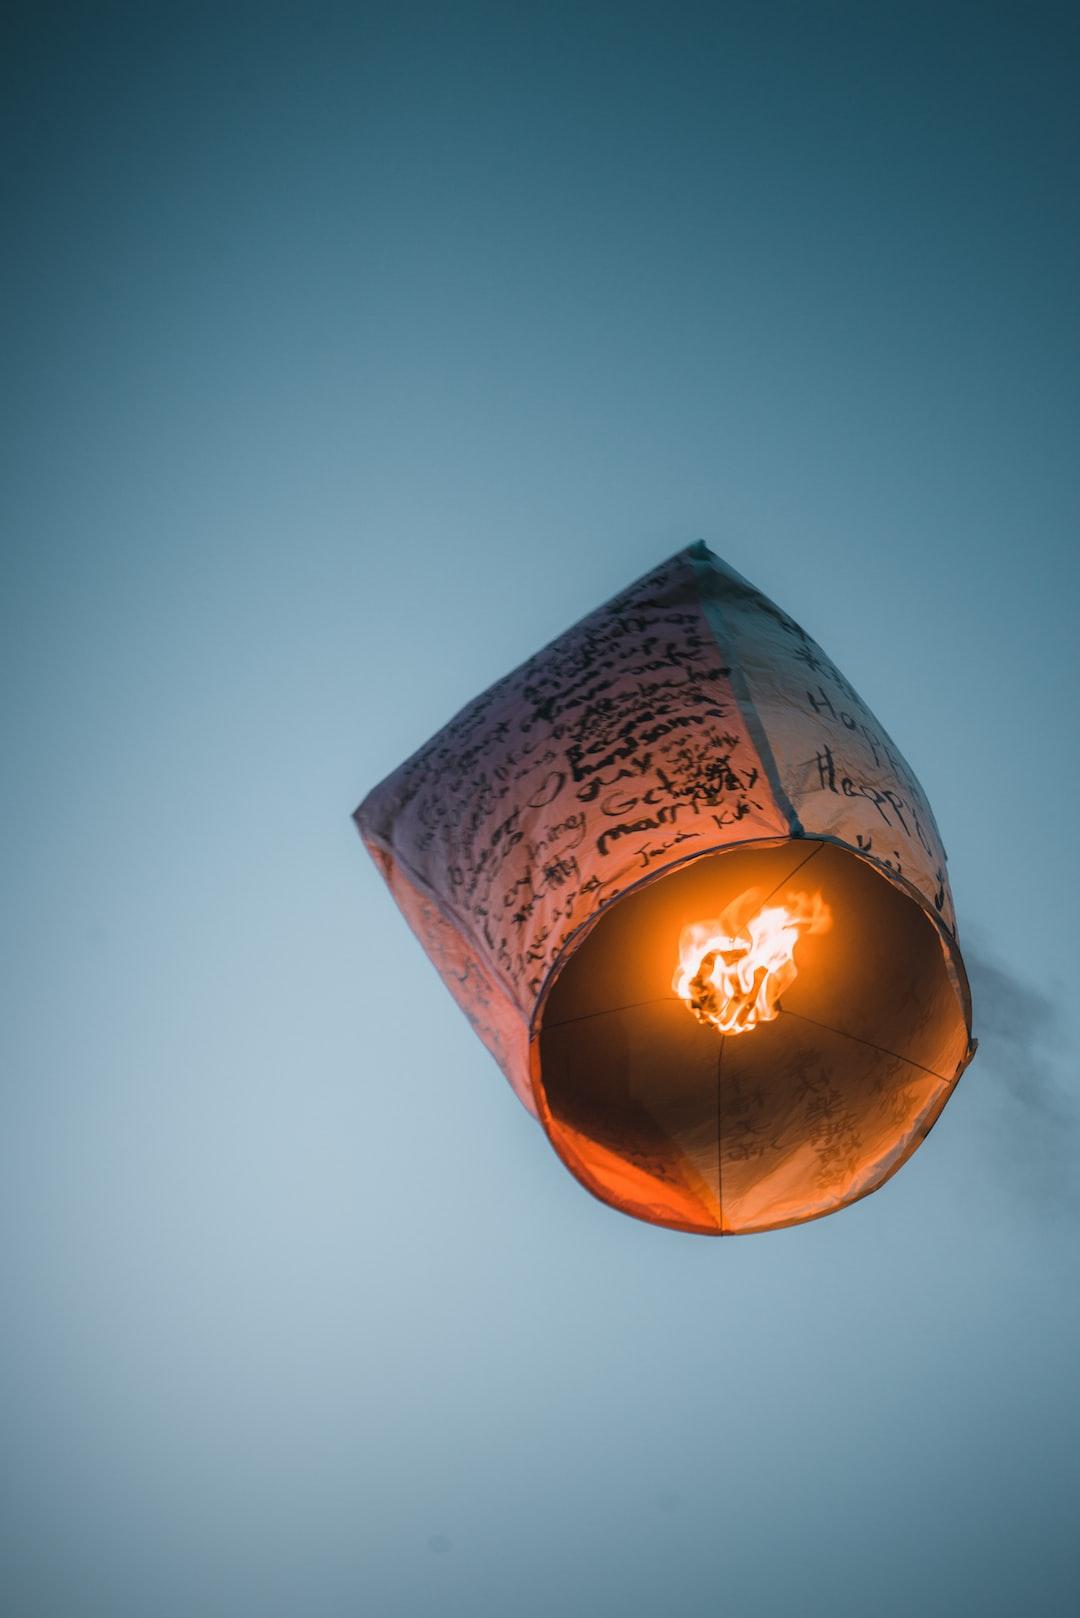 Sky lantern, Shifen, Taiwan